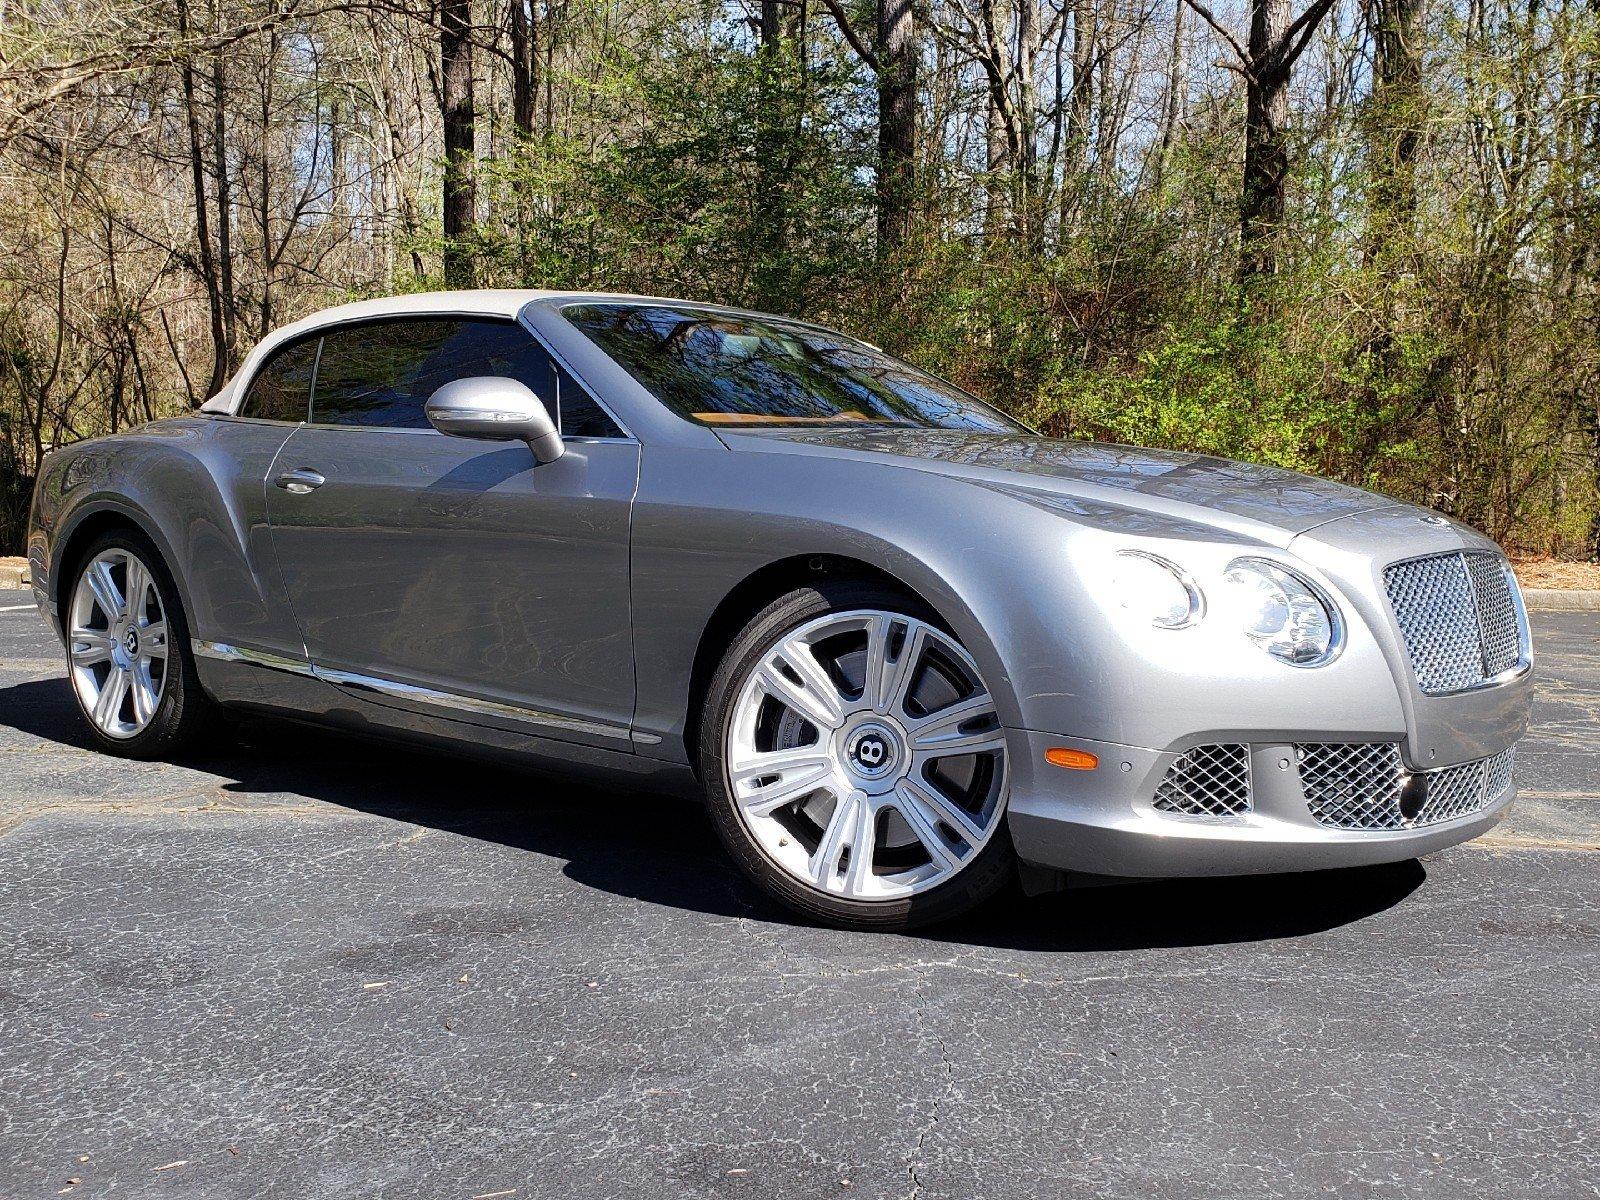 2013 Bentley Continental GTC W12 Mulliner Convertible